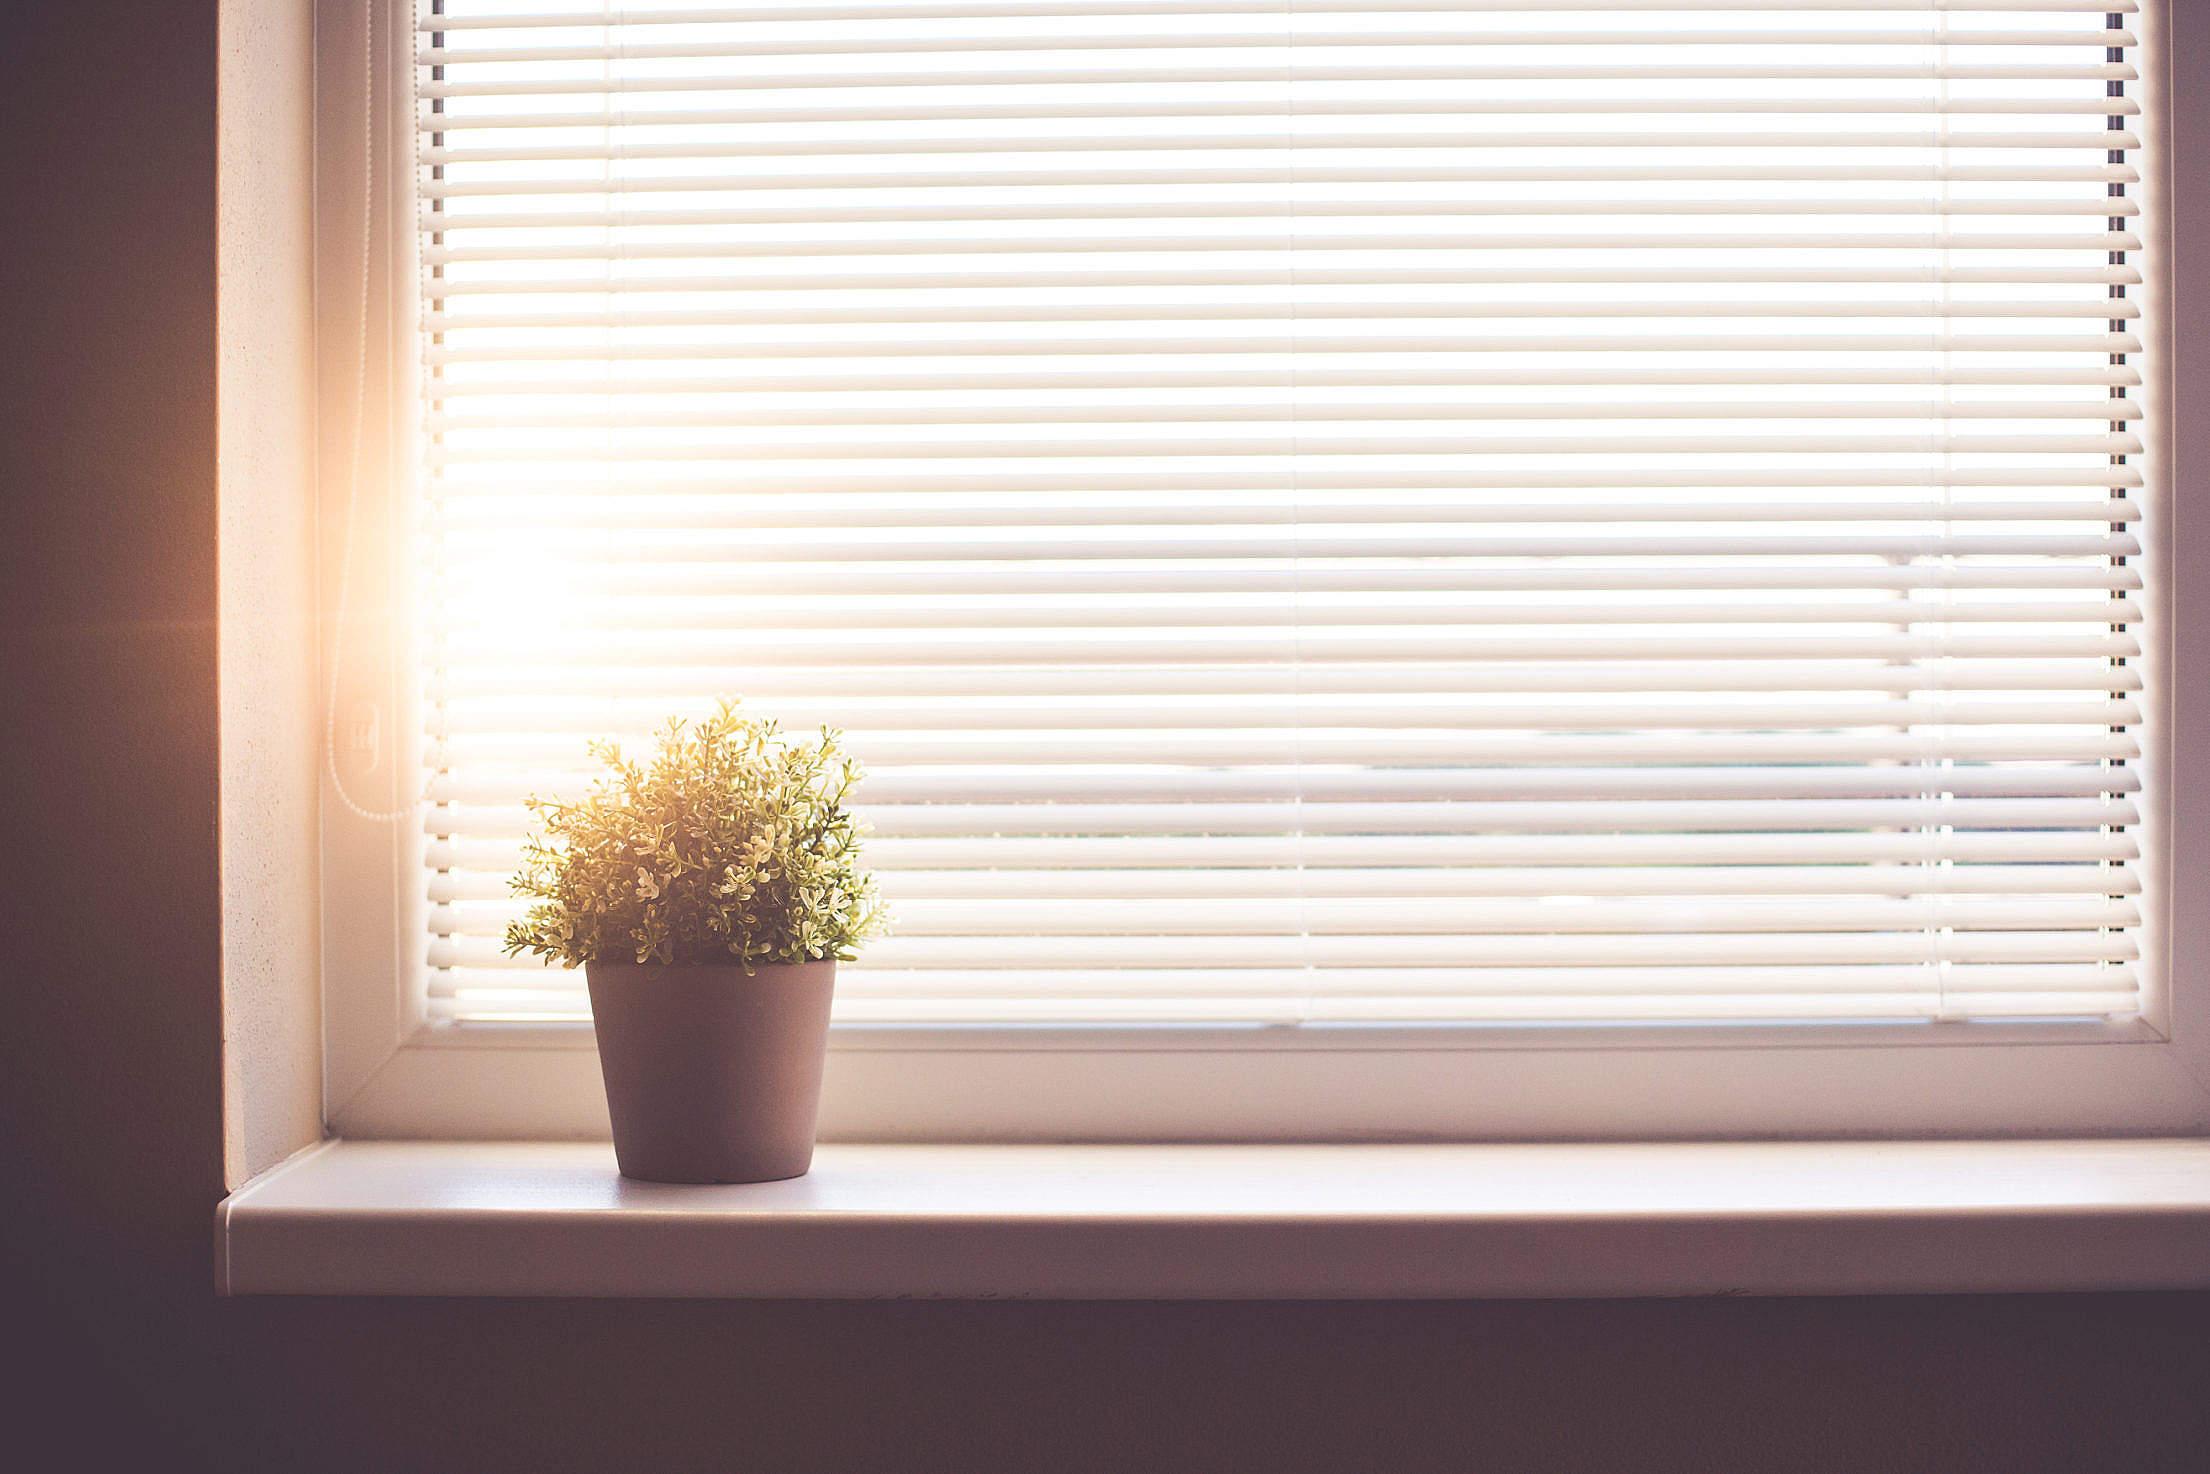 Sun Shining Through the Window with Sun Blind Free Stock Photo